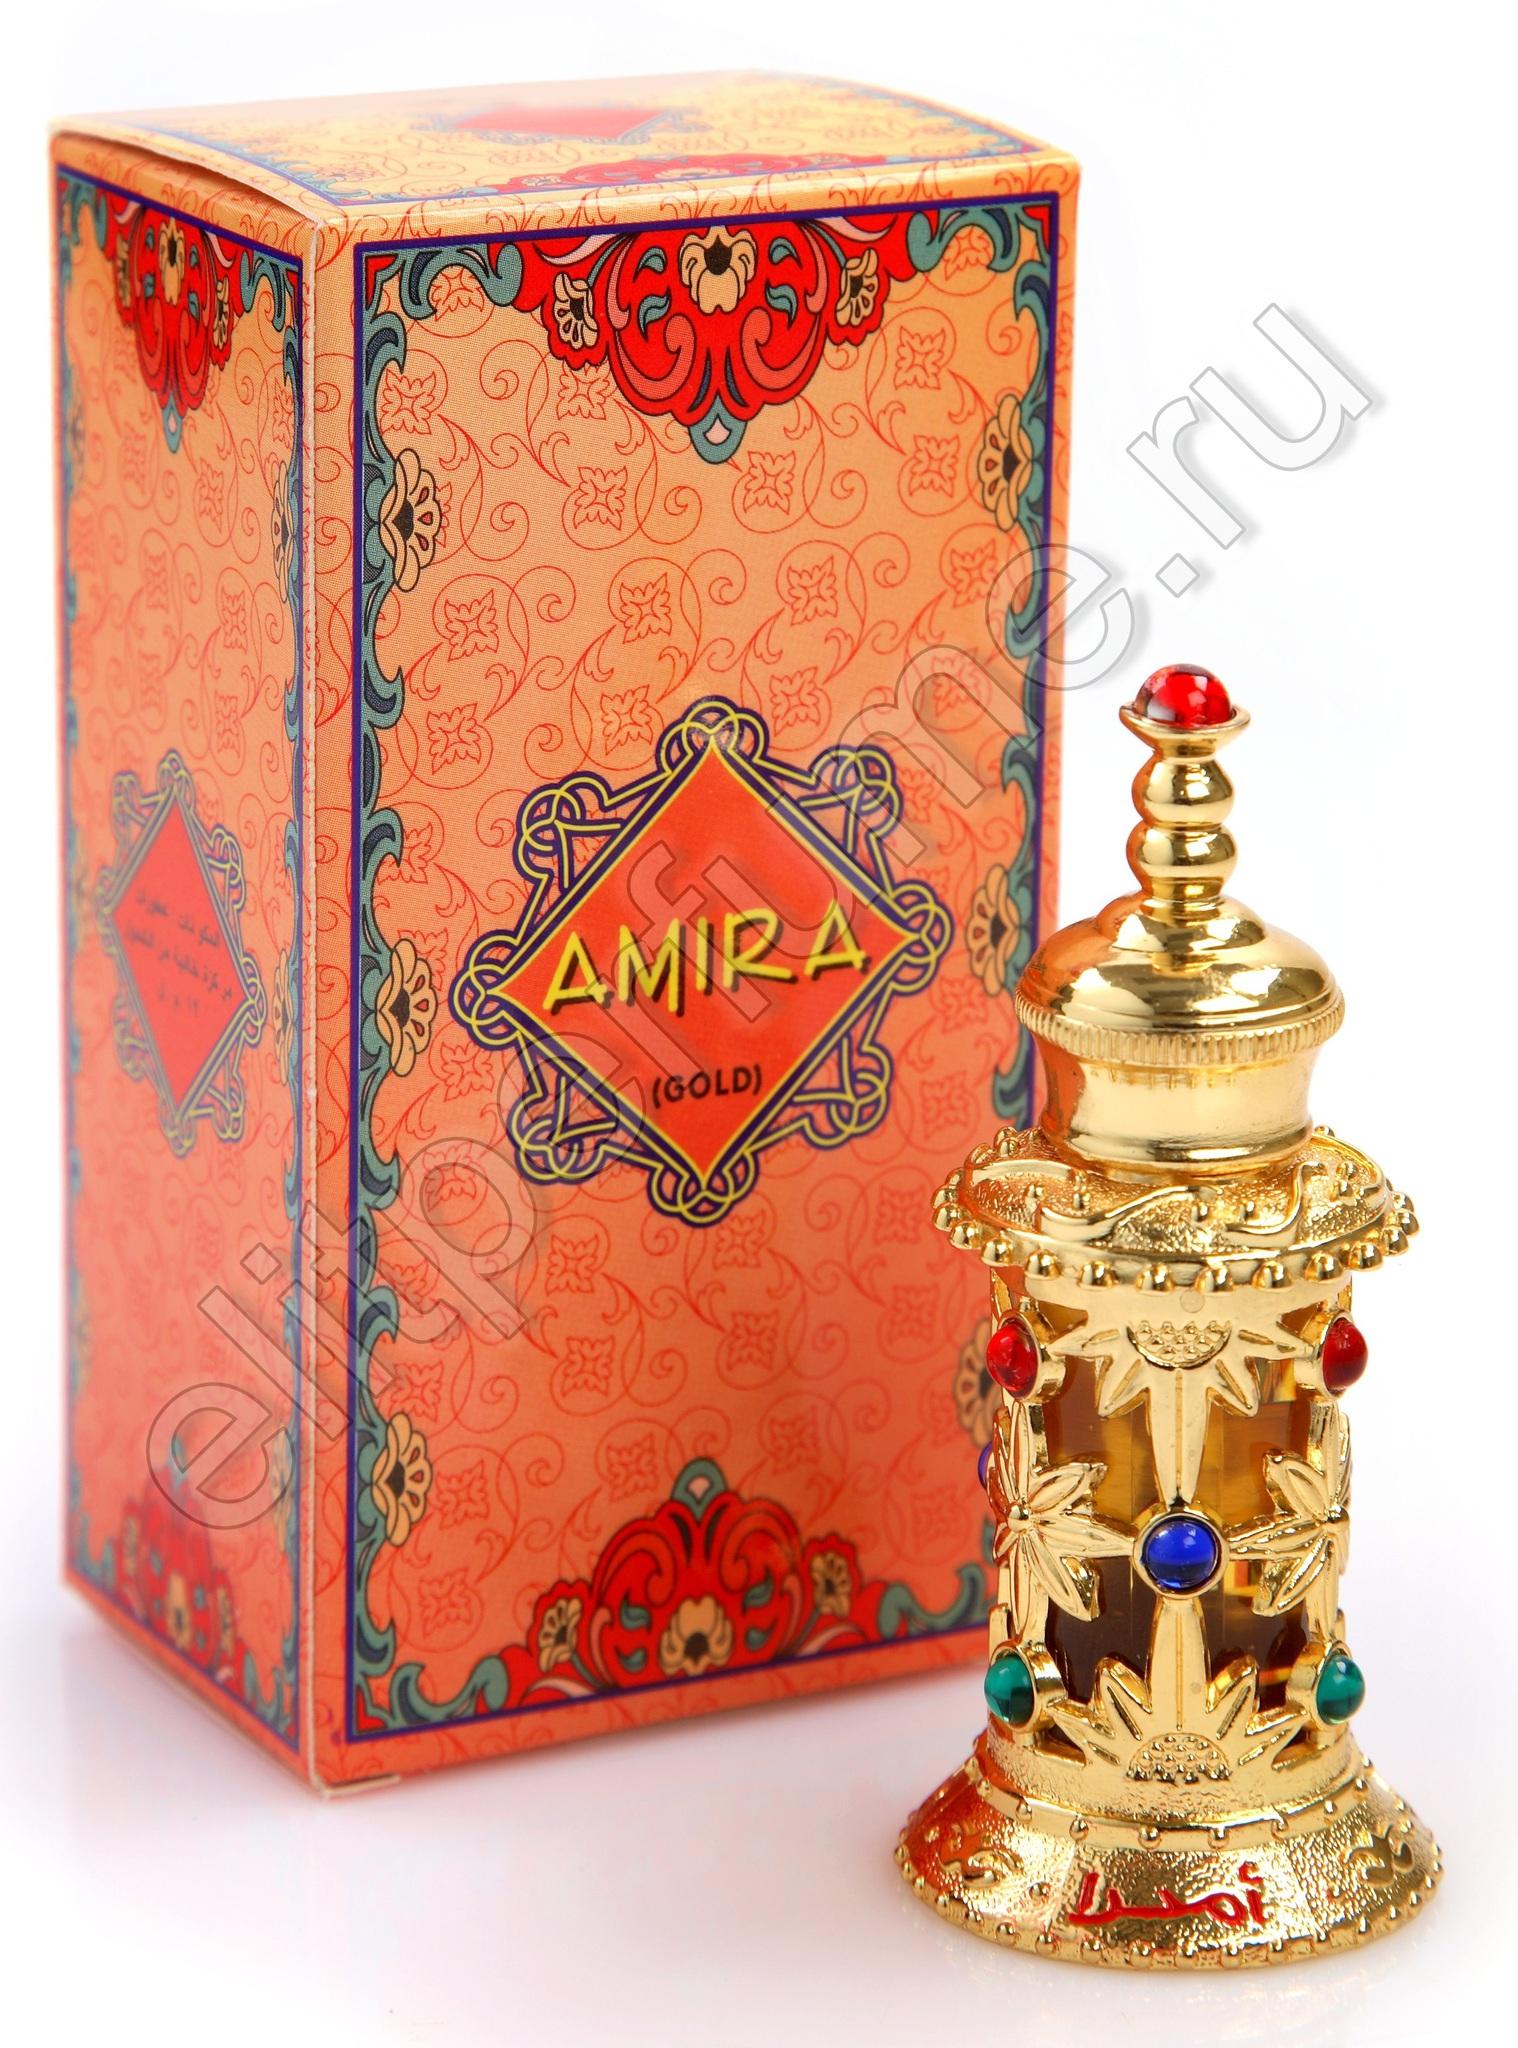 Амира (Золото) Amira (Gold) 12 мл арабские масляные духи от Аль Харамайн Al Haramain Perfumes